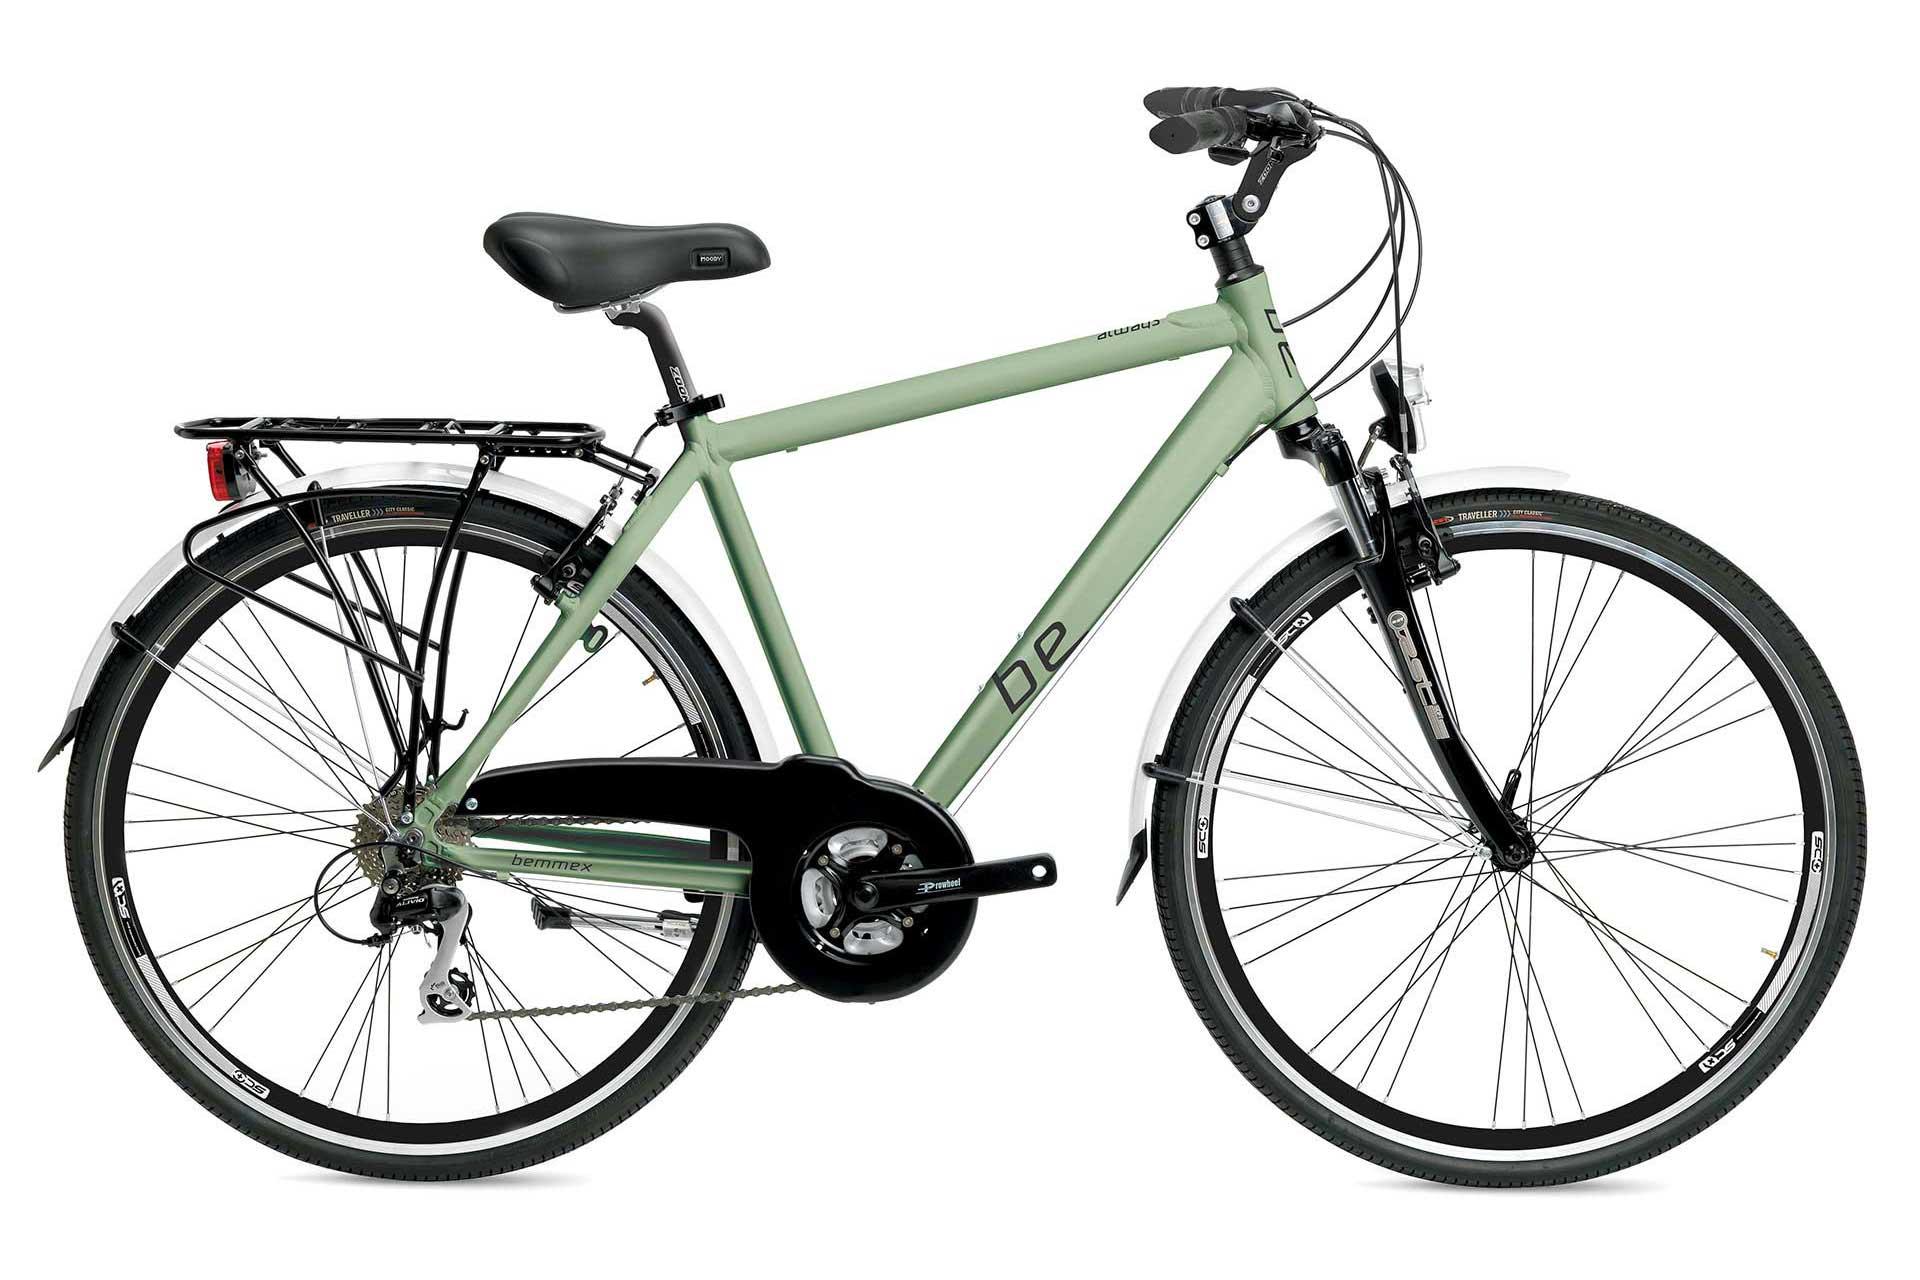 Sardinia Bike Green Group Bemmex Alway 3 Man